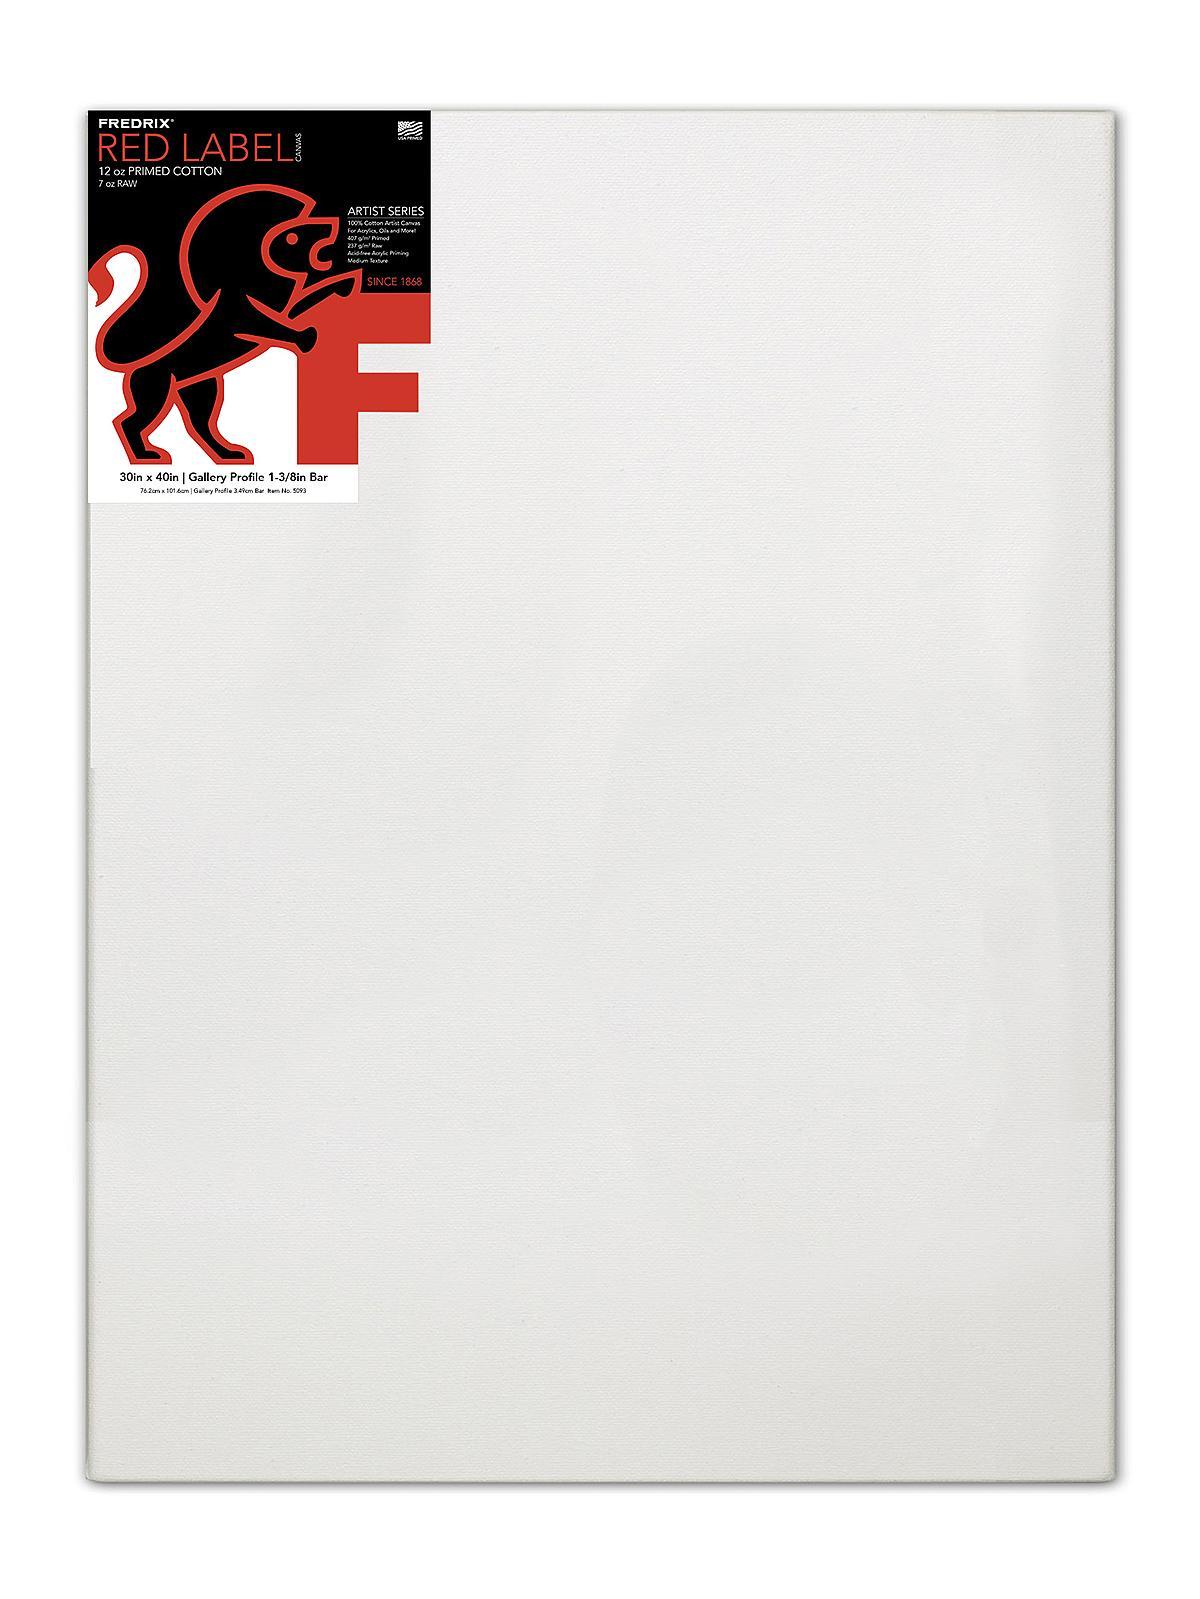 Fredrix Gallerywrap Stretched Canvas | MisterArt.com